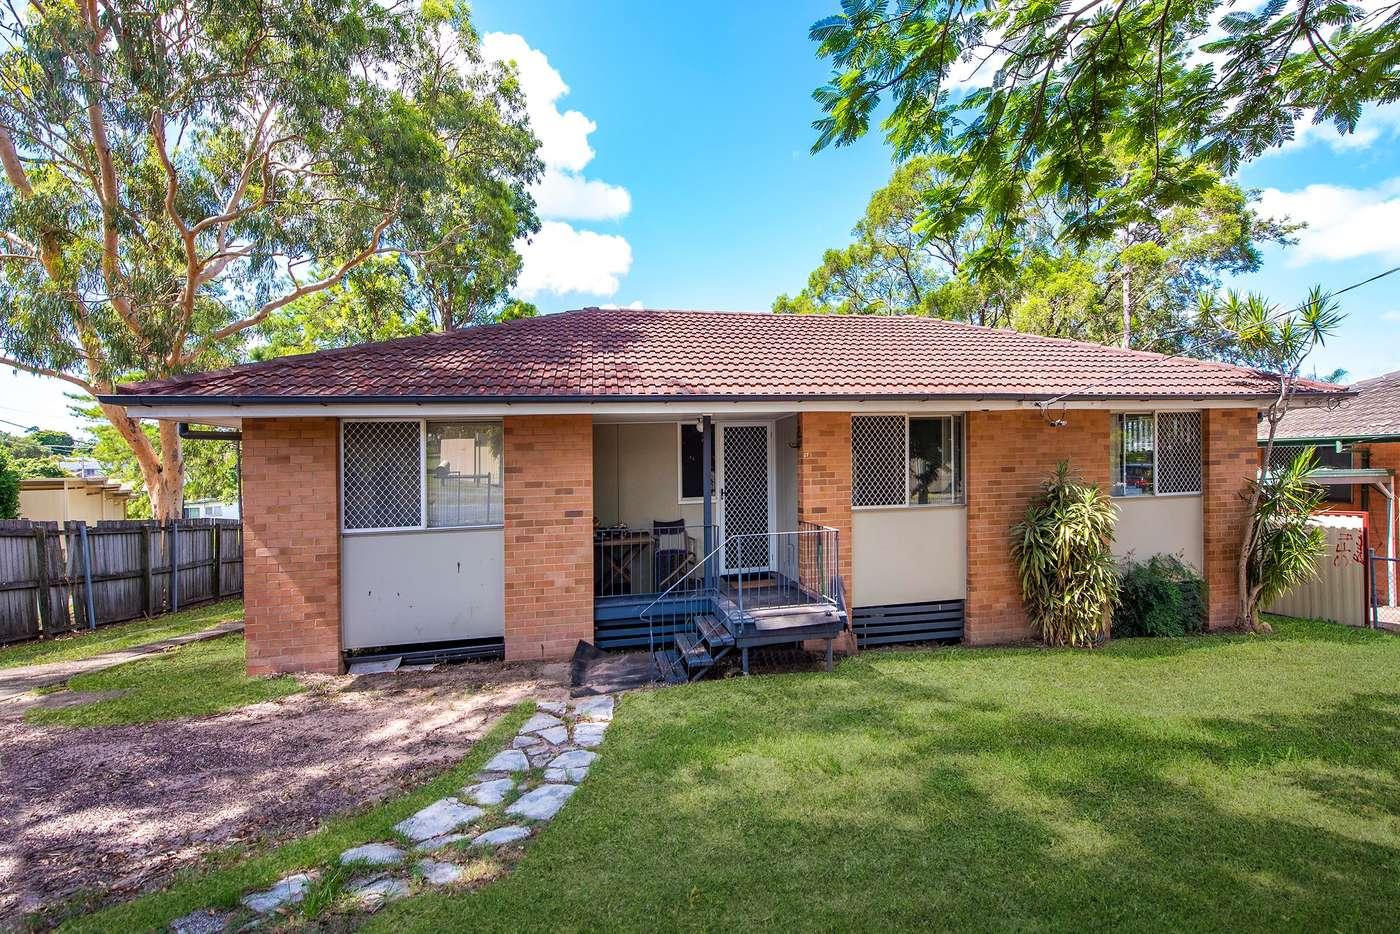 Main view of Homely house listing, 17 Bramston Street, Woodridge QLD 4114